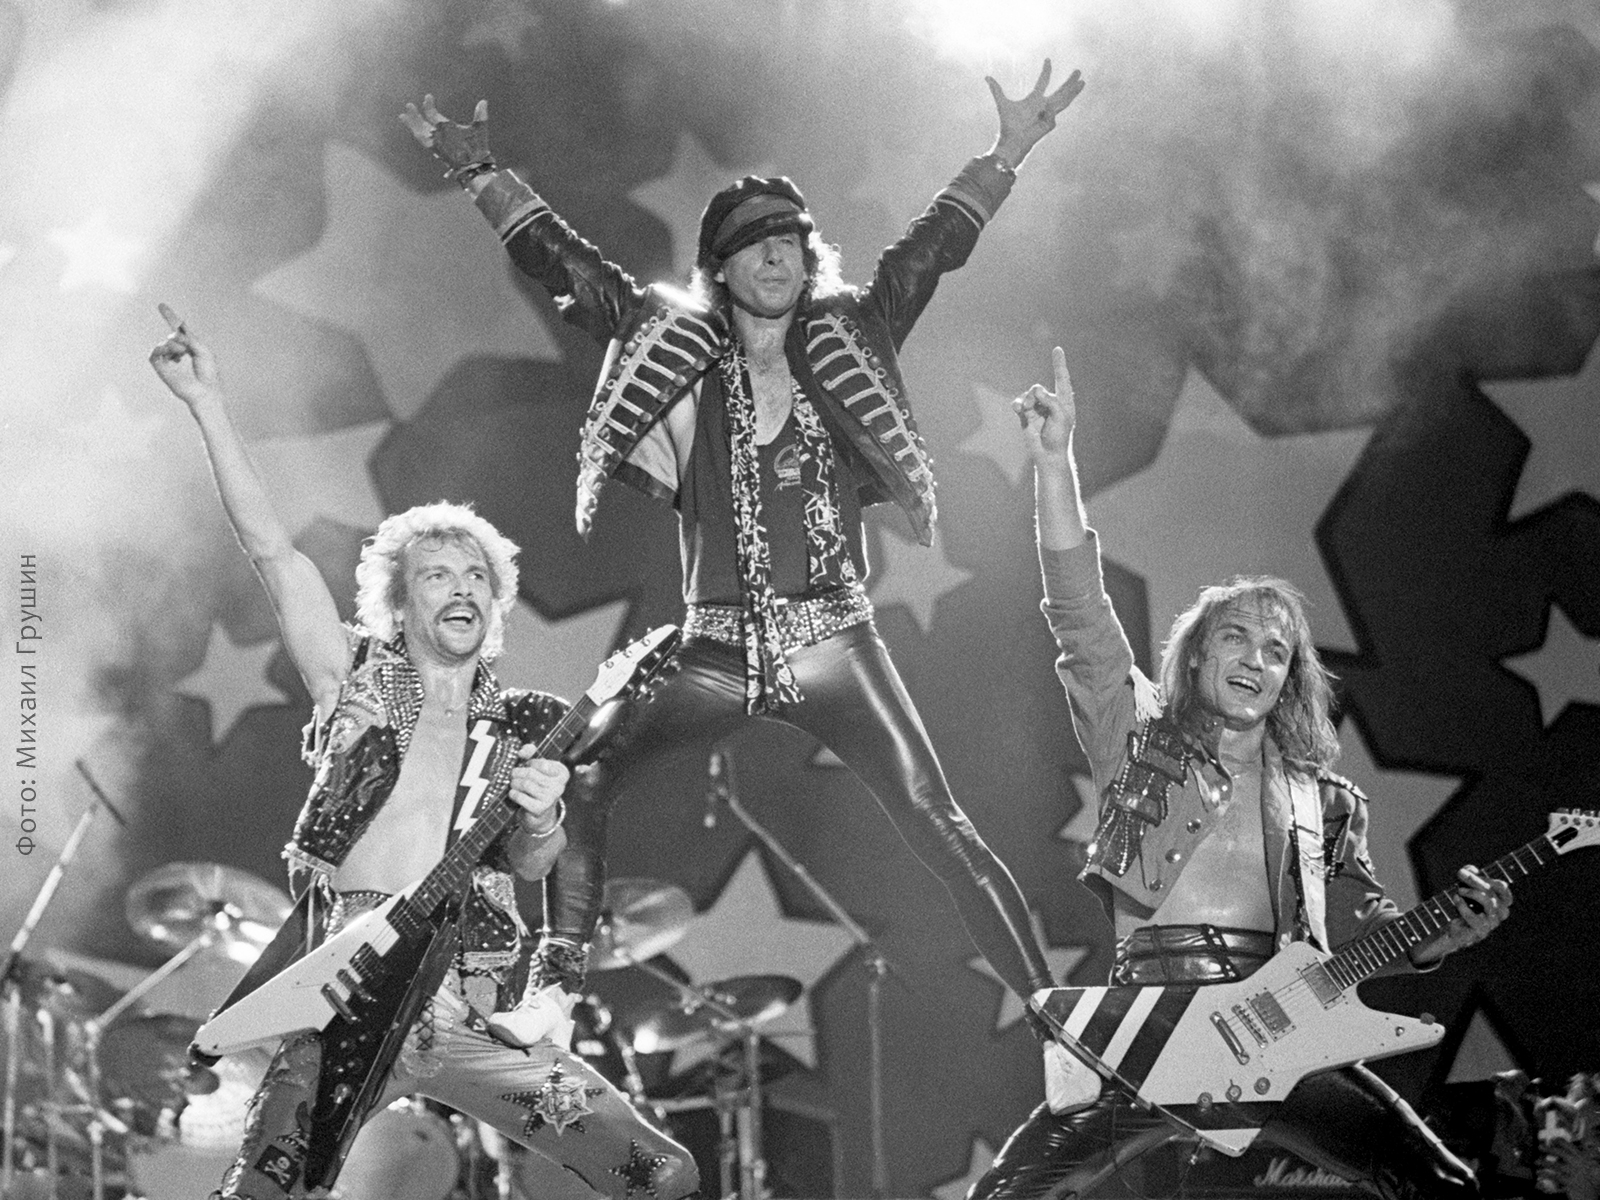 Группа Scorpions. Moscow Music Peace Festival